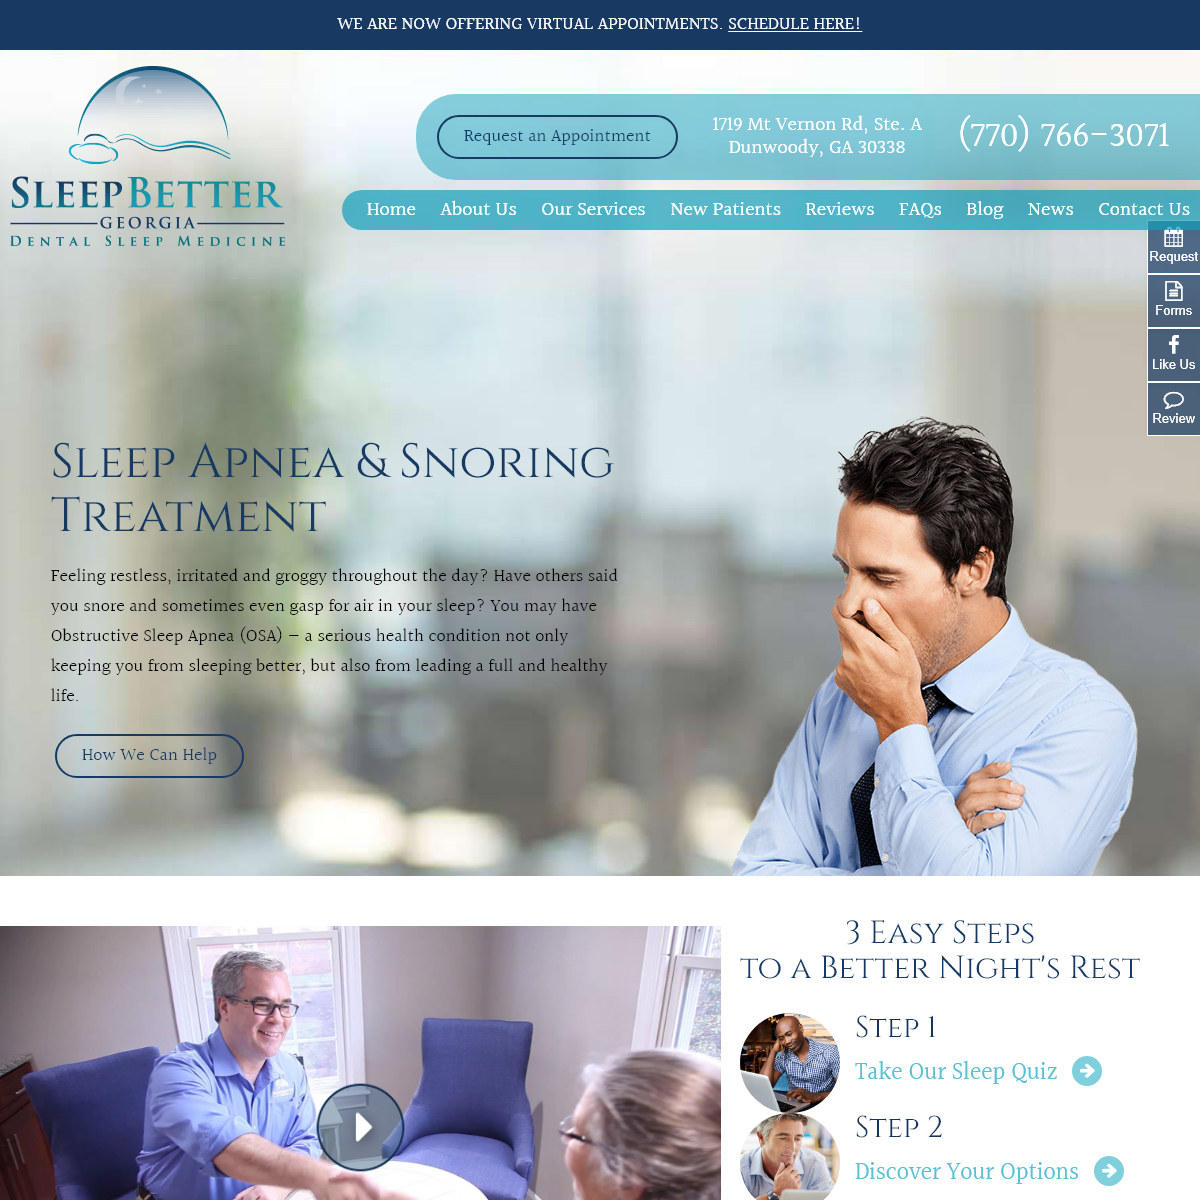 Dunwoody Sleep Apnea Therapy - Dental Sleep Medicine Norcross - Sleep Better Georgia